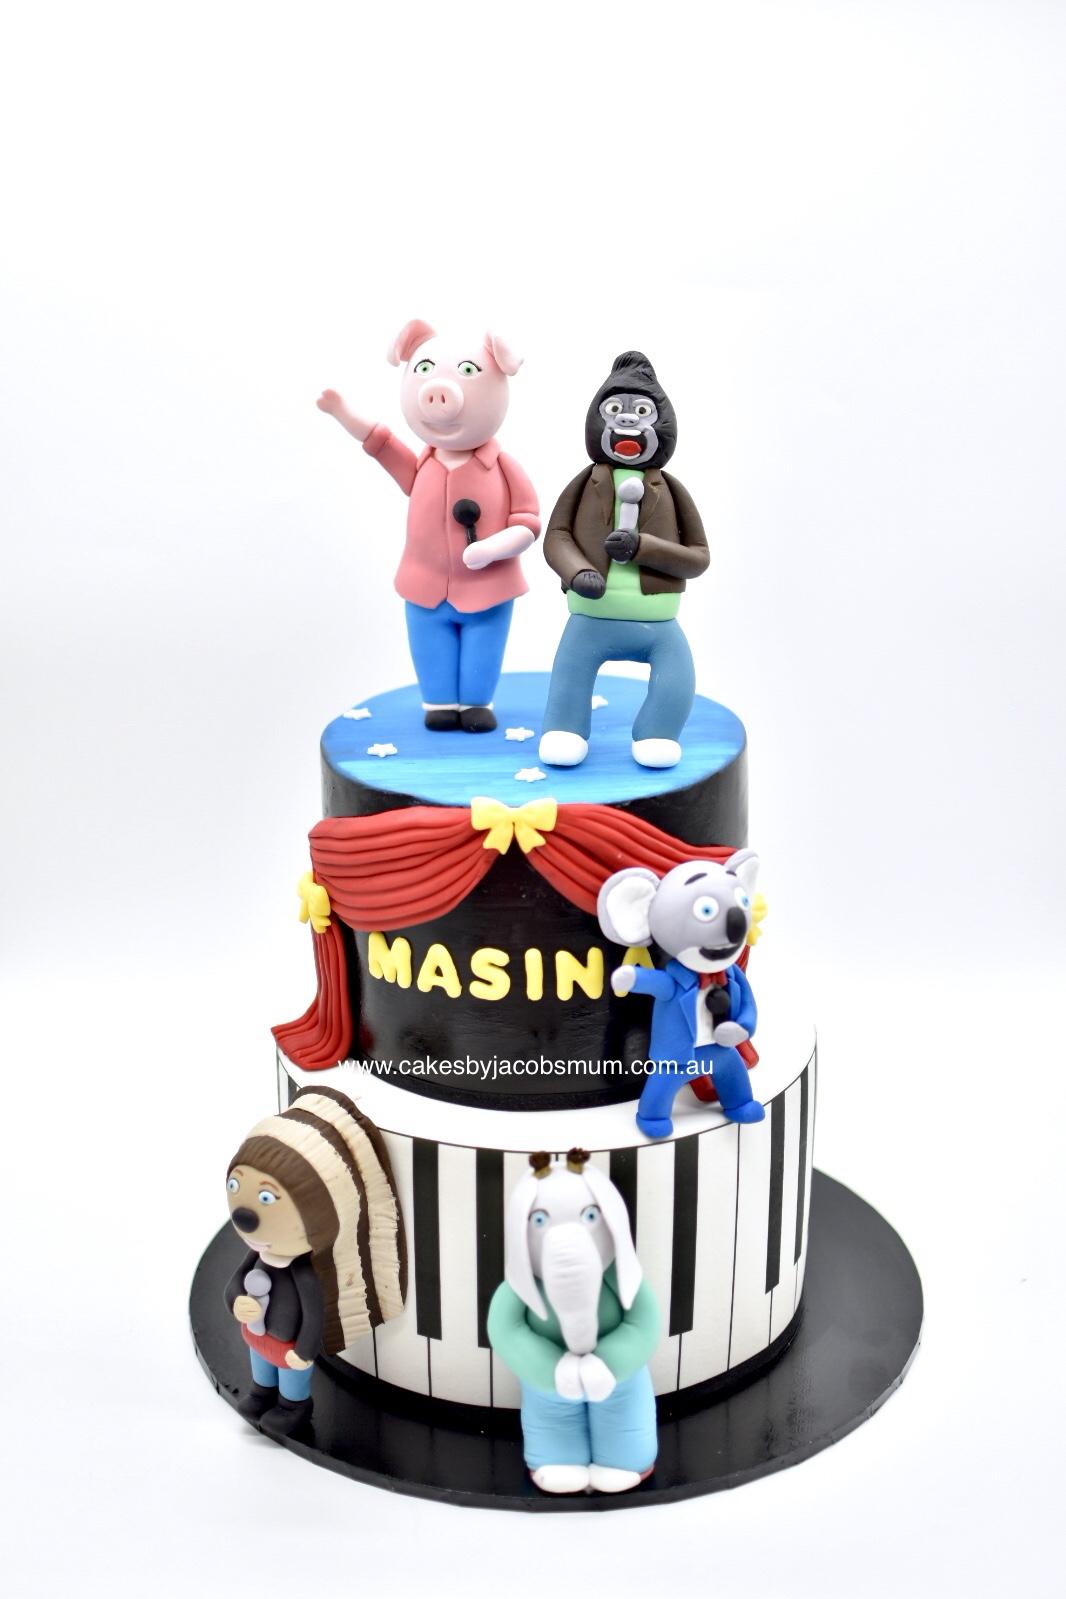 Sing Birthday Cake